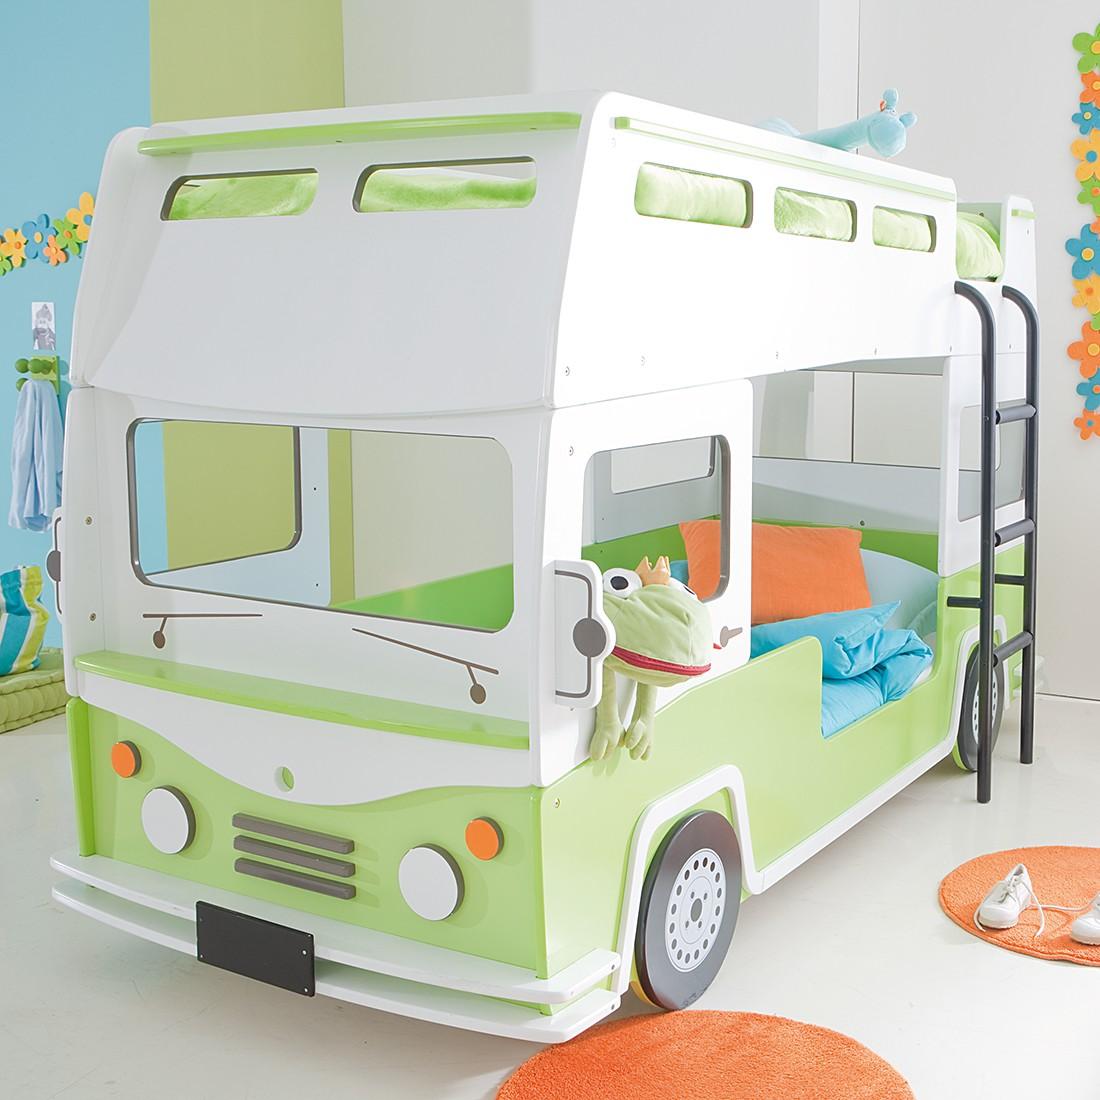 kinder doppelbett hippolyt with kinder doppelbett good hoppekids halbhohes bett eule with. Black Bedroom Furniture Sets. Home Design Ideas